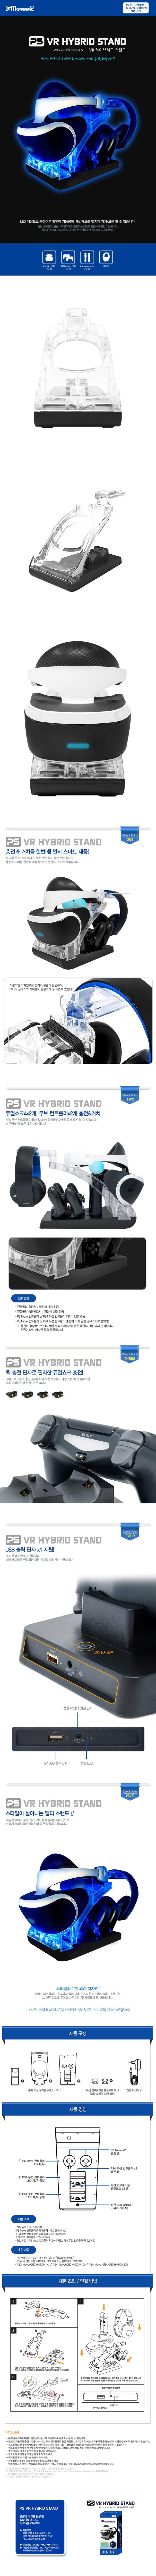 VRhybrid_stand.jpg